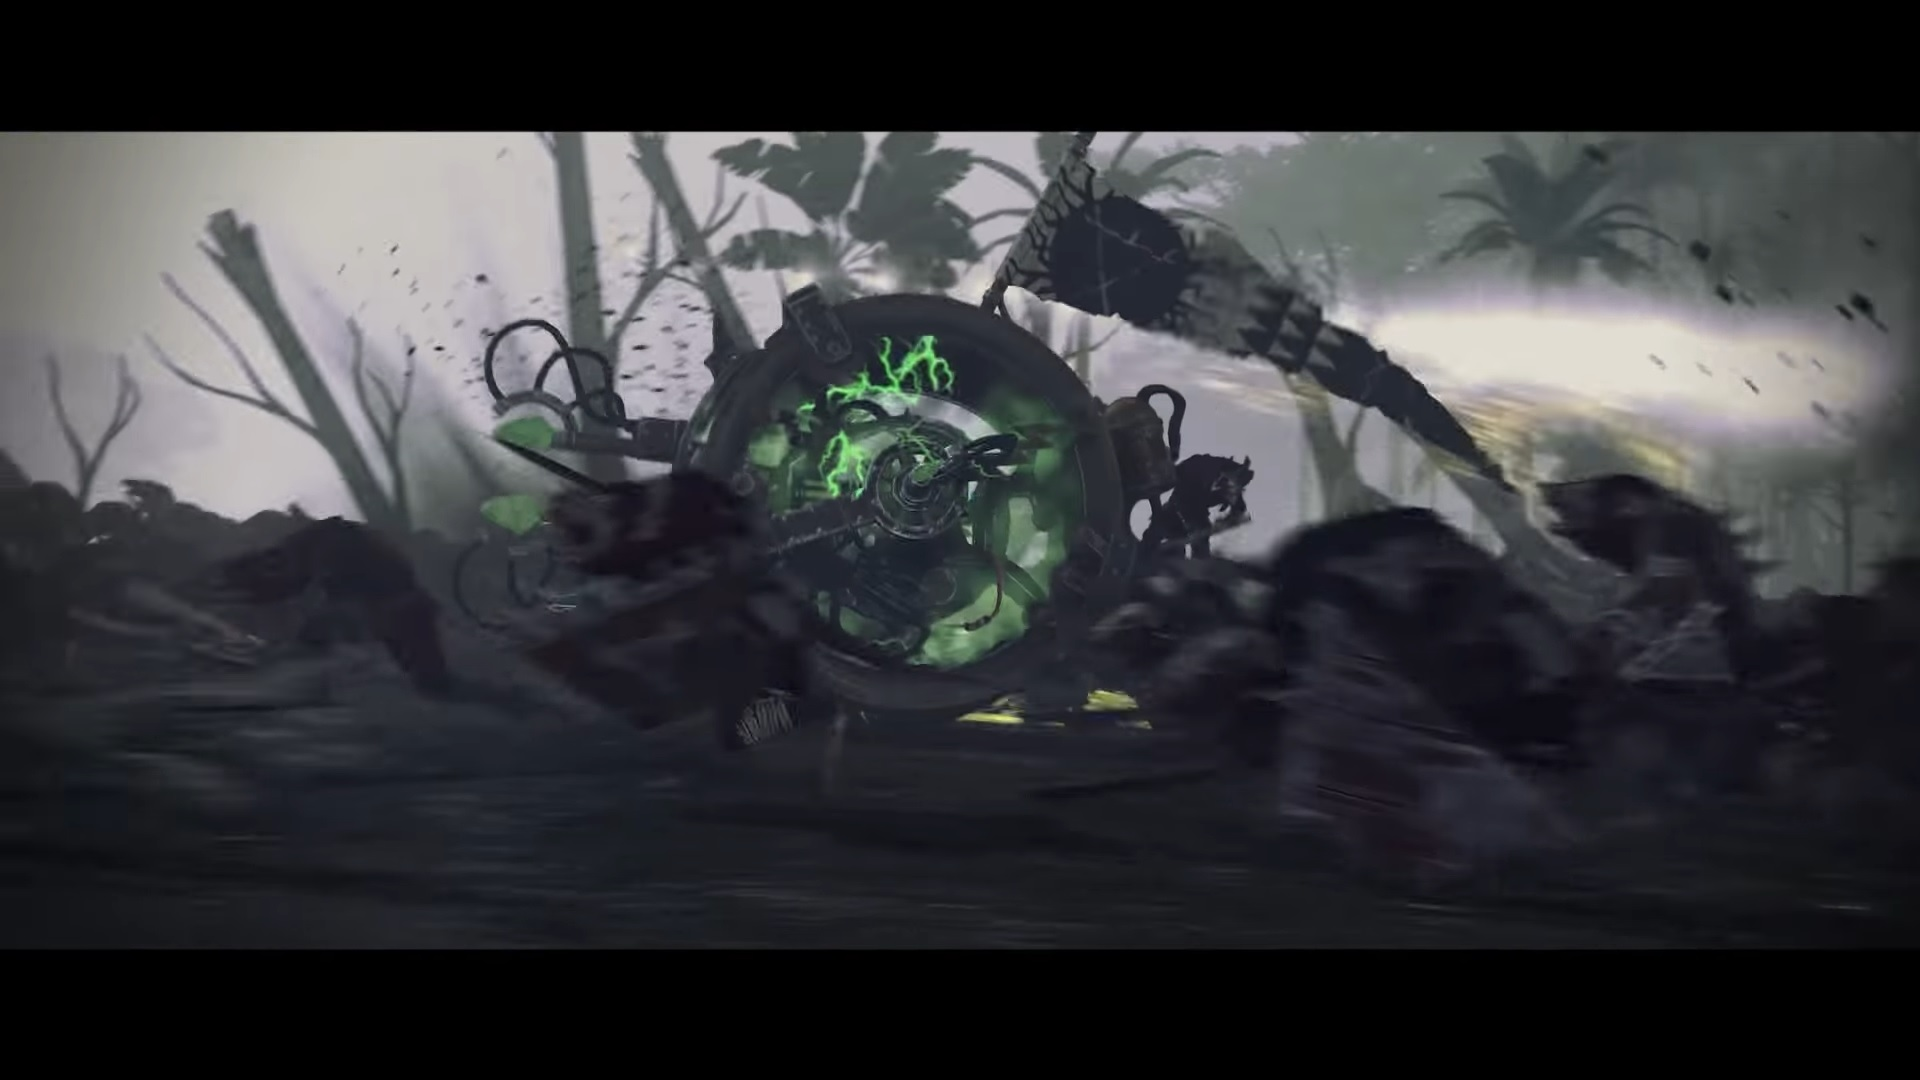 Total War: Warhammer II's final race is the Skaven screenshot